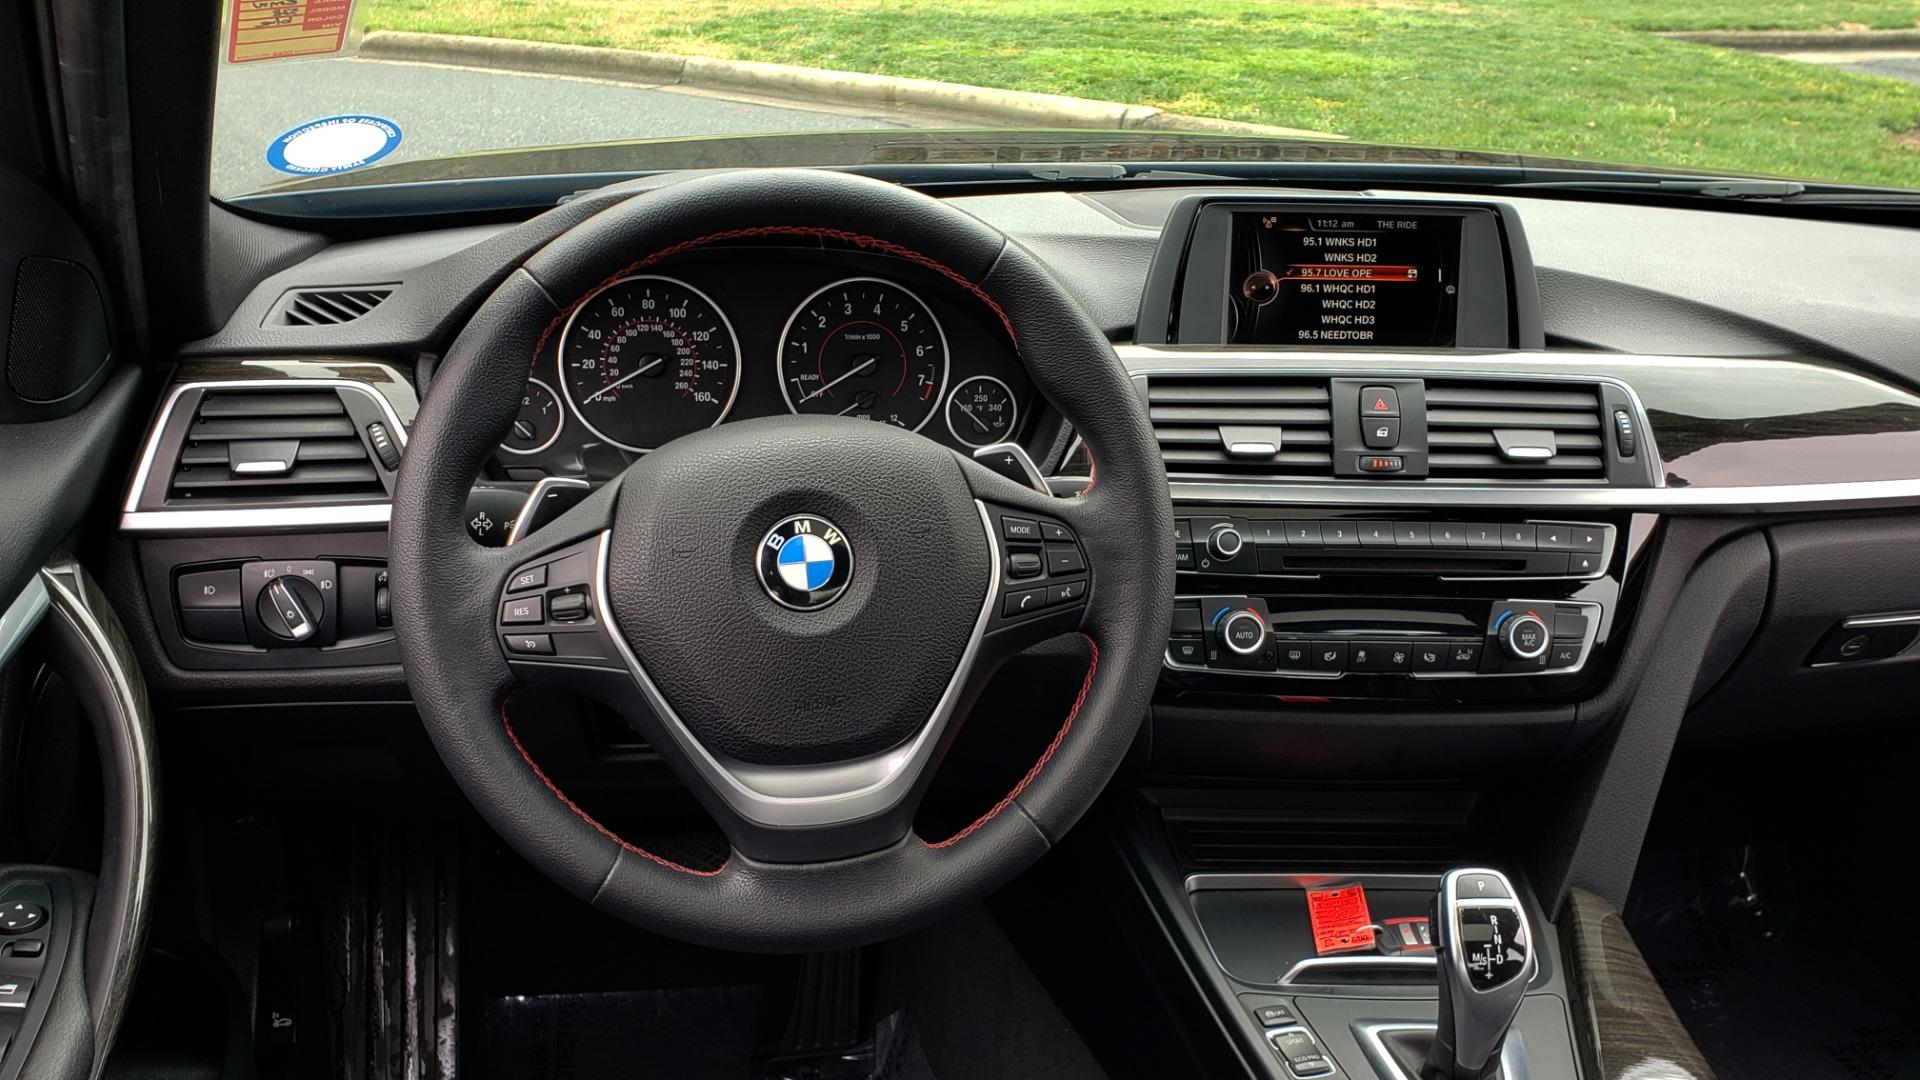 Used 2016 BMW 3 SERIES 328I PREMIUM PKG / DRVR ASST / SUNROOF / PARK ASST for sale Sold at Formula Imports in Charlotte NC 28227 35